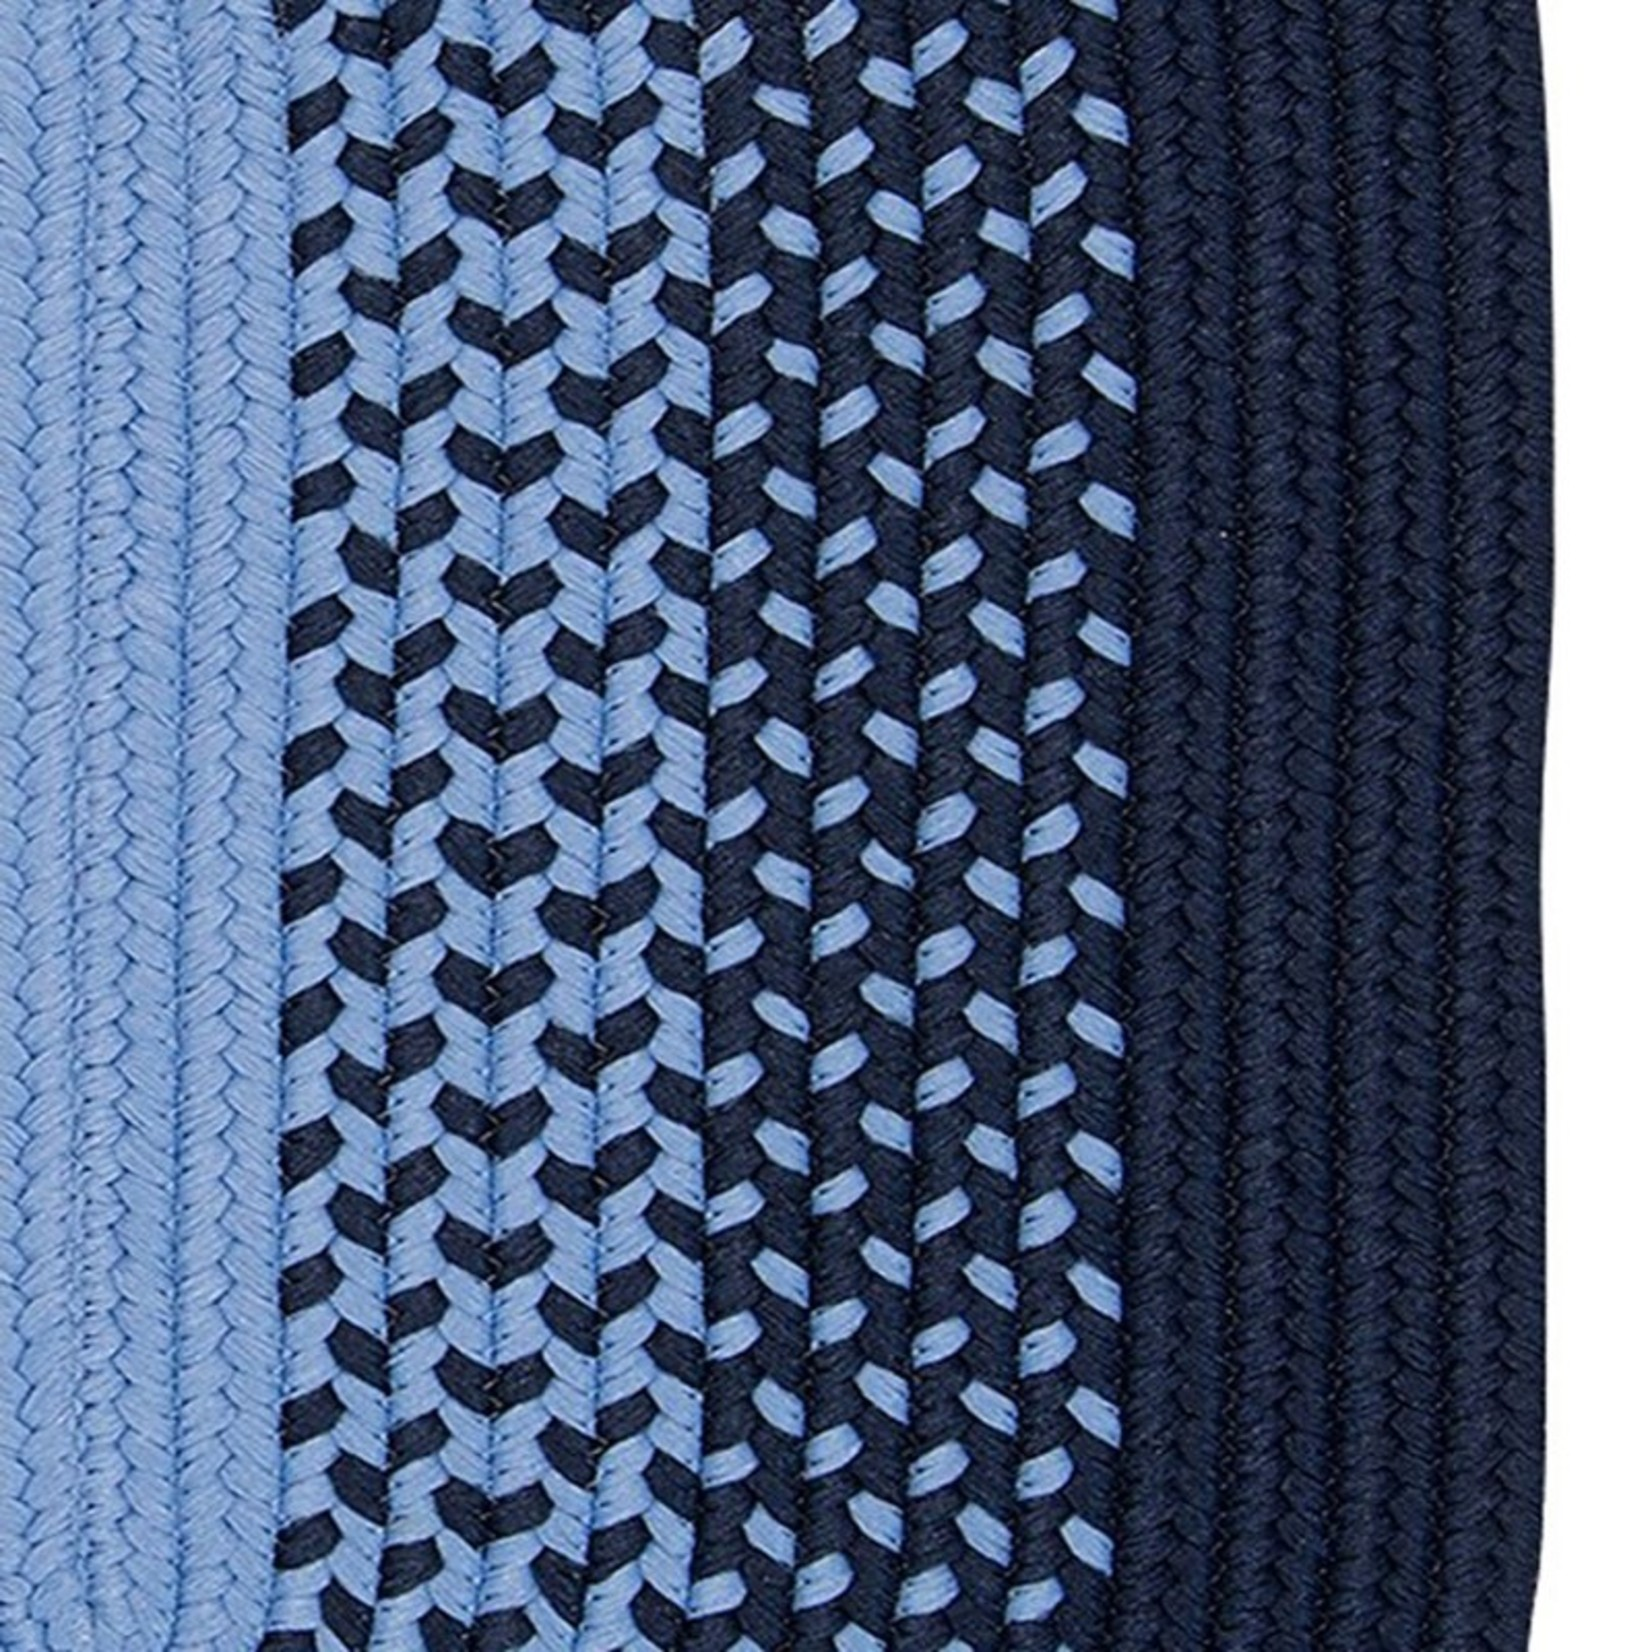 *4' x 6' Oval - Herewardus Braided Navy/Blue Indoor/Outdoor Rug